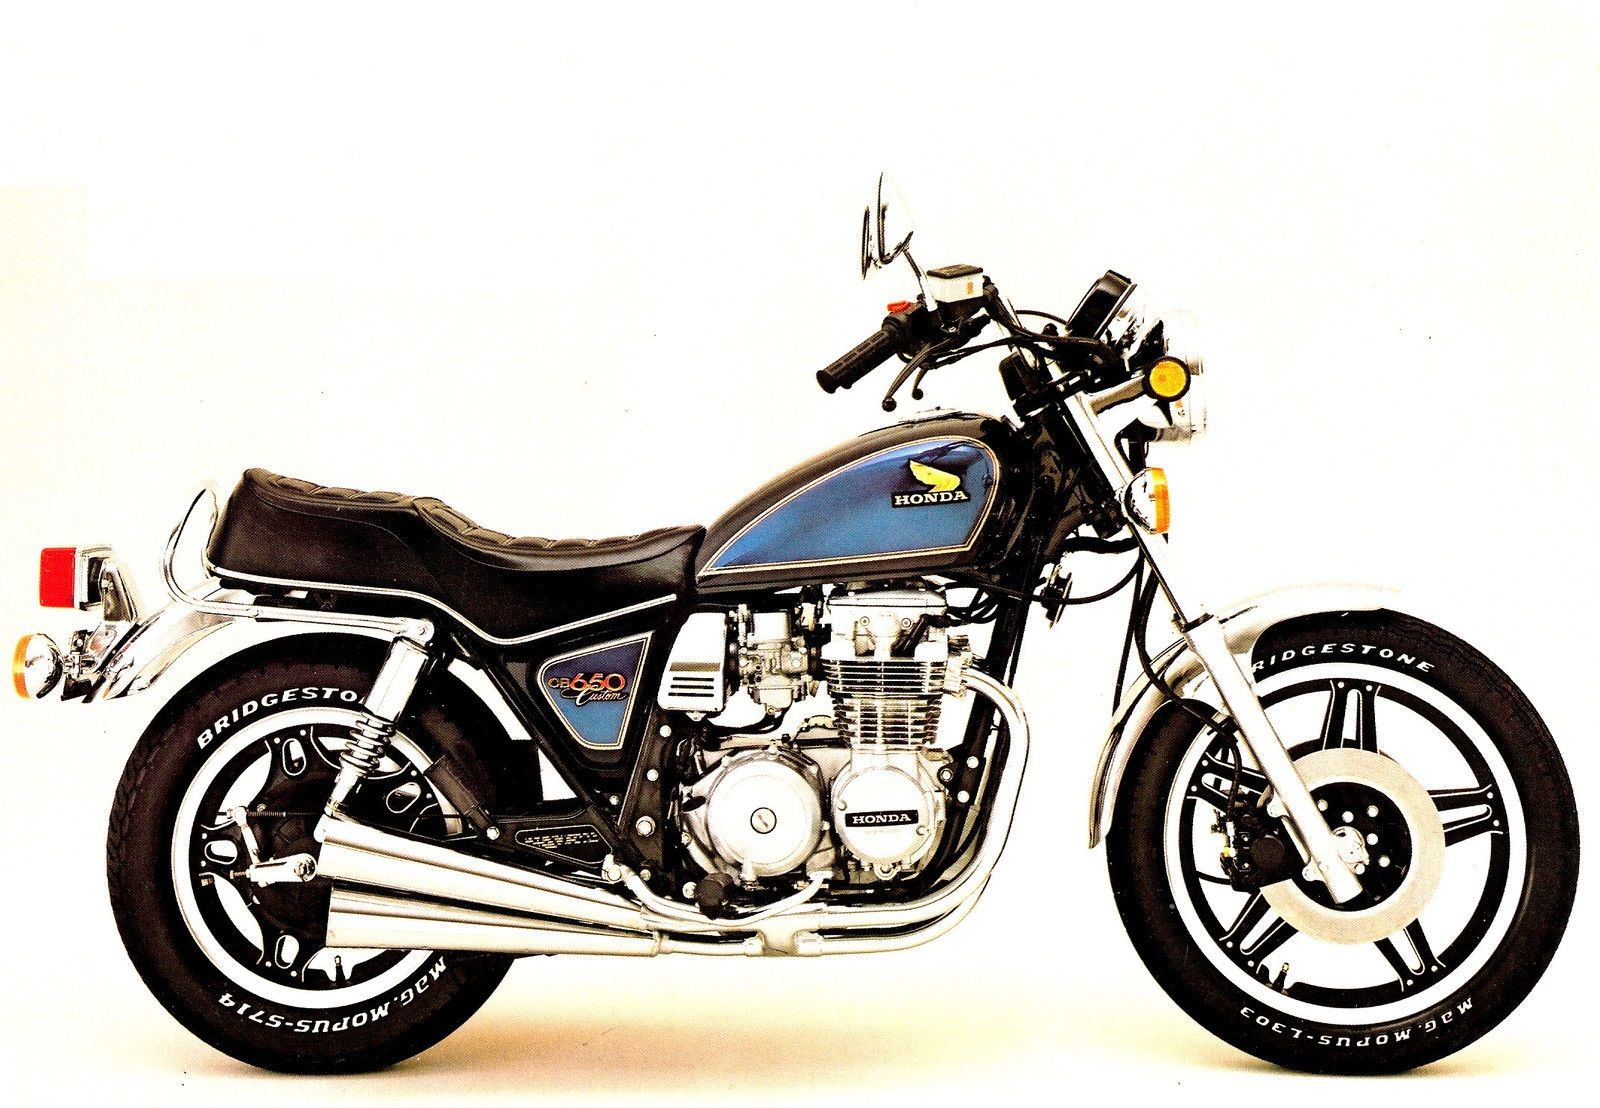 Honda Cb650c Custom 1981 Honda Bikes Vintage Honda Motorcycles Classic Motorcycles [ 1108 x 1600 Pixel ]